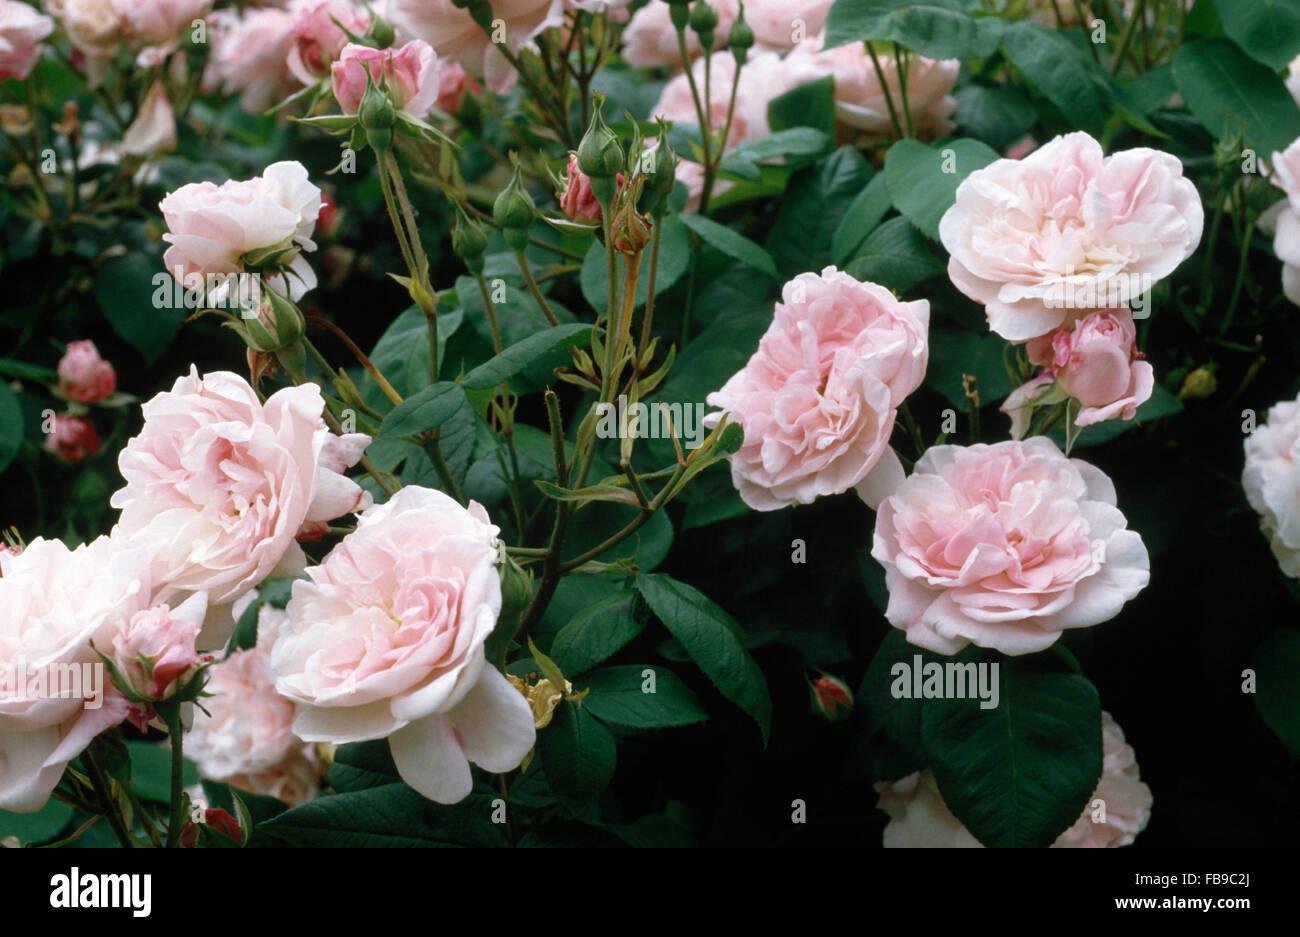 Nahaufnahme von blass rosa Great Maidens Blush Rosen Stockbild